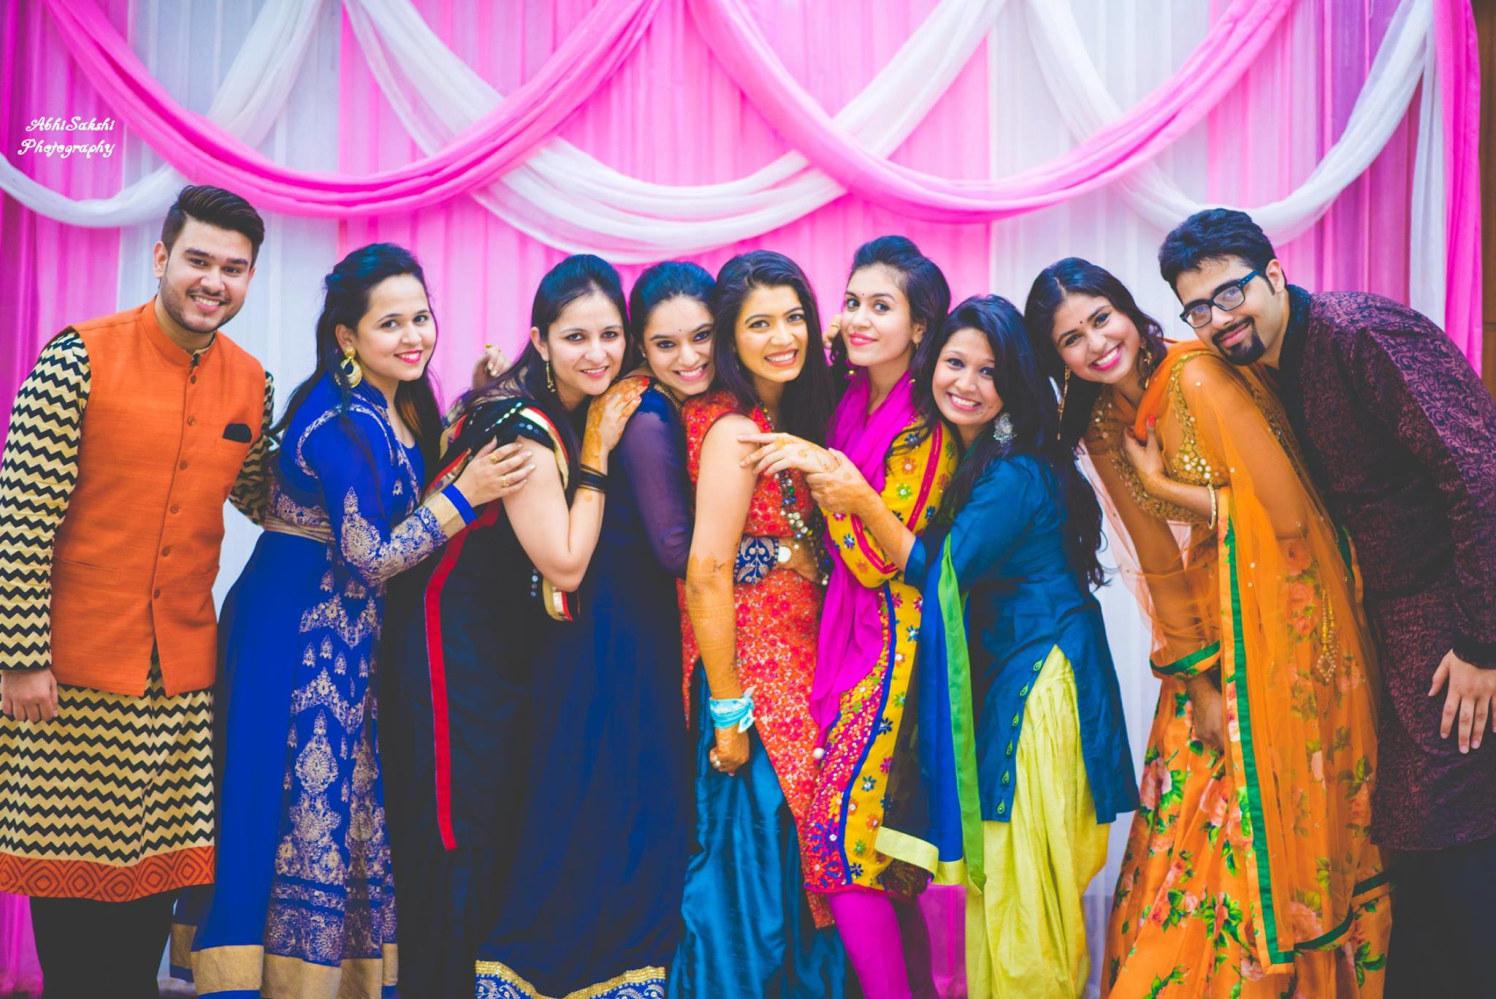 Haldi ceremony of the Bride by AbhiSakshi Photography Wedding-photography | Weddings Photos & Ideas